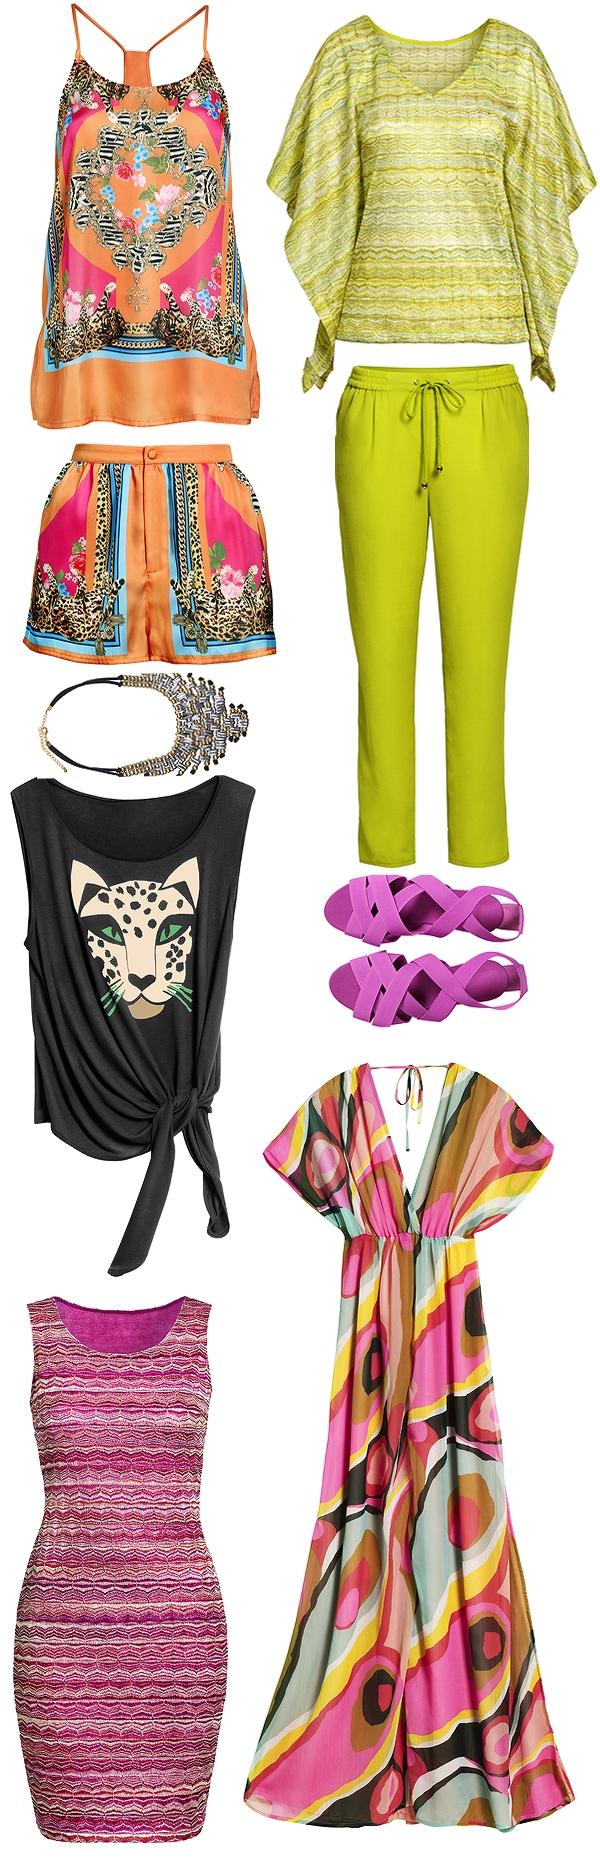 hm april, nyheder H&M, new in H&M H&M forår 2012, H&M spring 2012, neon gul bukser, mønstret maxikjole, neon yellow pants